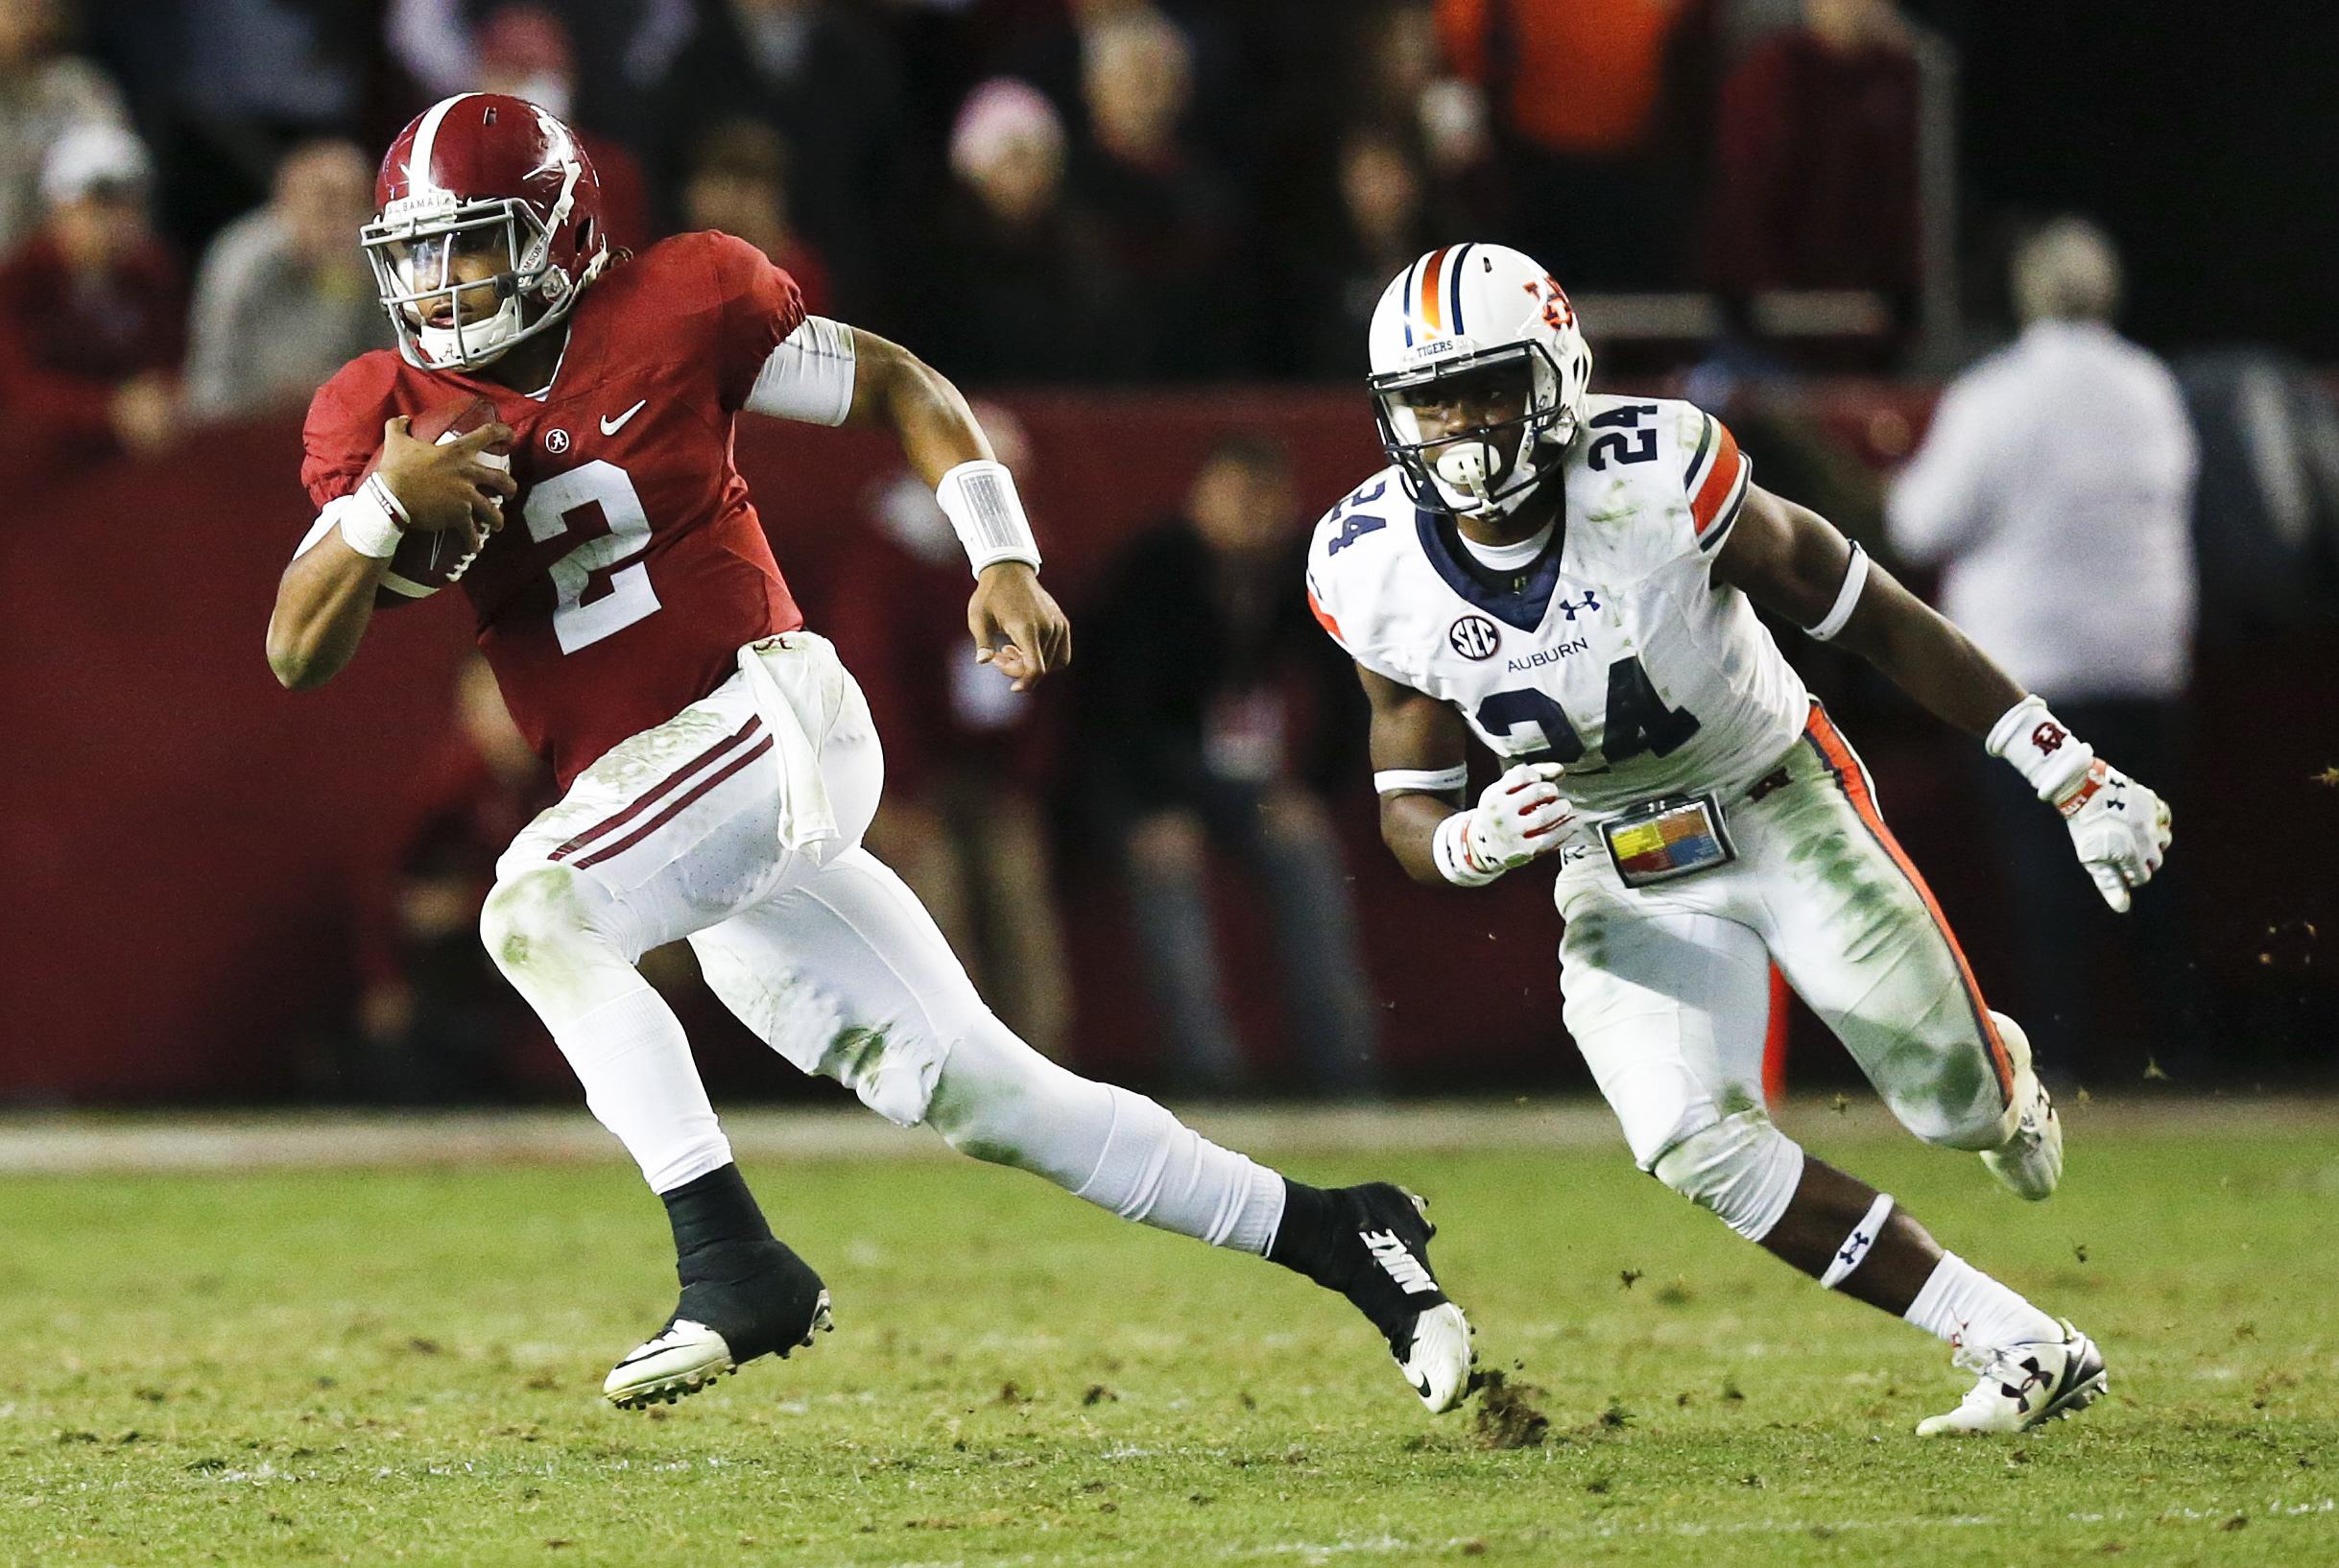 Alabama quarterback Jalen Hurts runs the ball against Auburn defensive back Daniel Thomas during the second half of the Iron Bowl NCAA college football game, Saturday, Nov. 26, 2016, in Tuscaloosa, Ala. Alabama won 30-12. (AP Photo/Brynn Anderson)